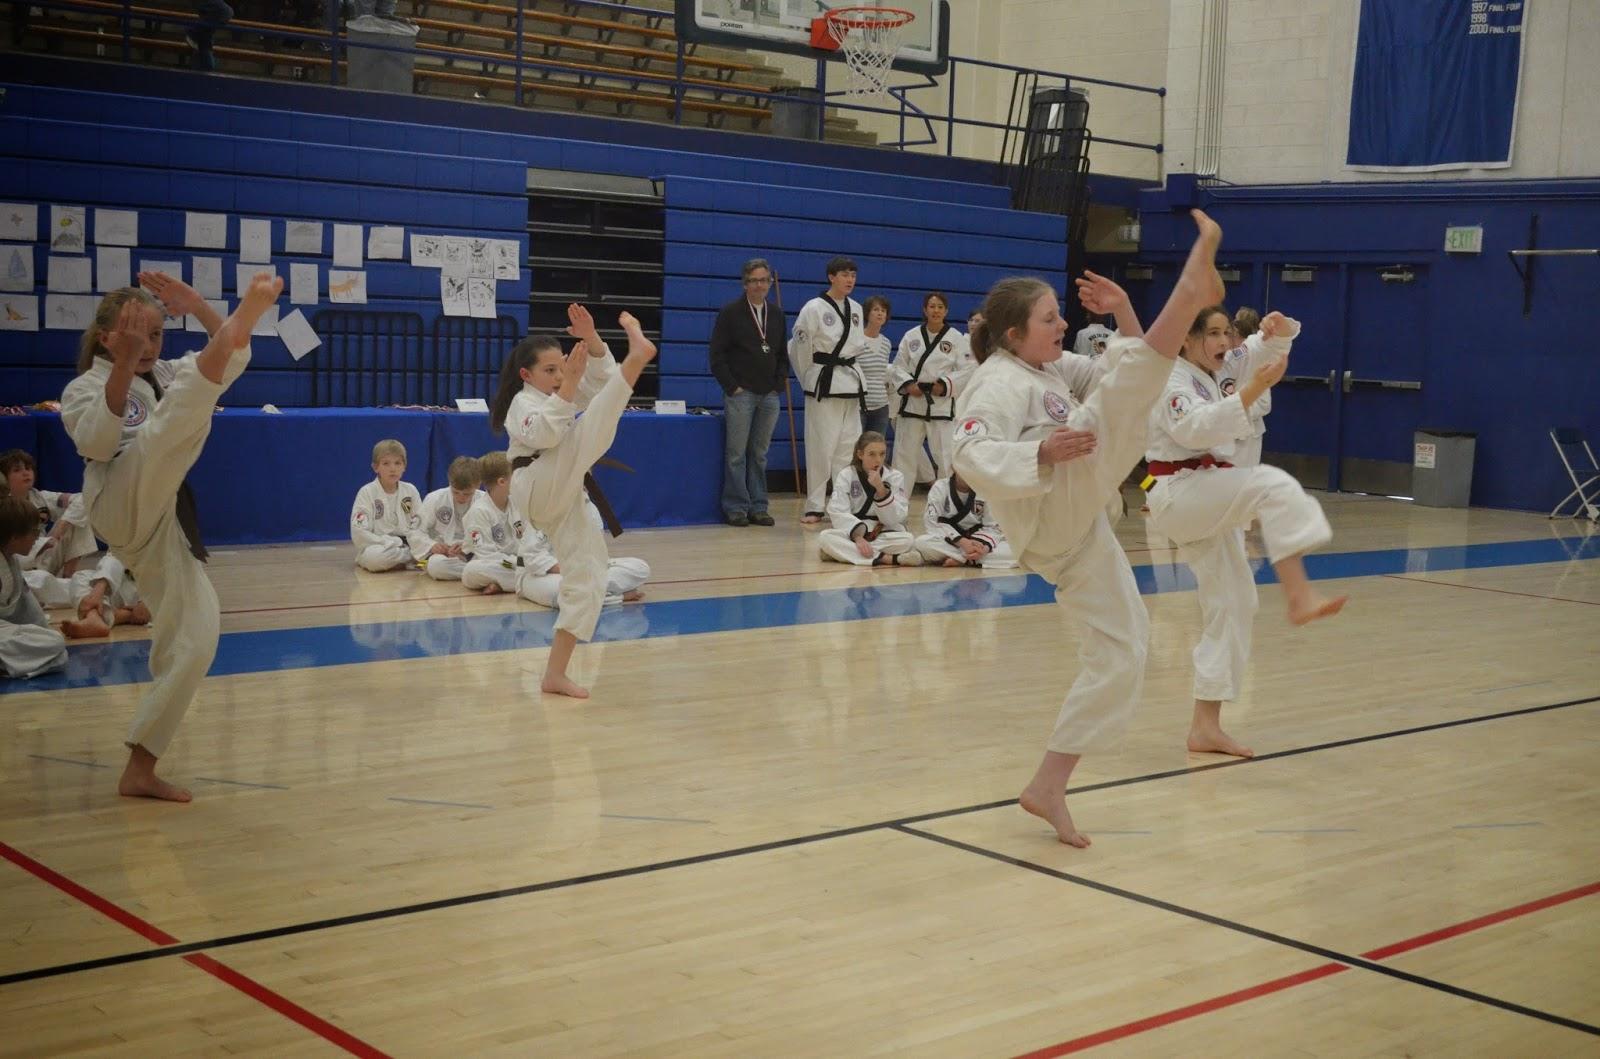 Martial art teen girls doing a front kick in unison